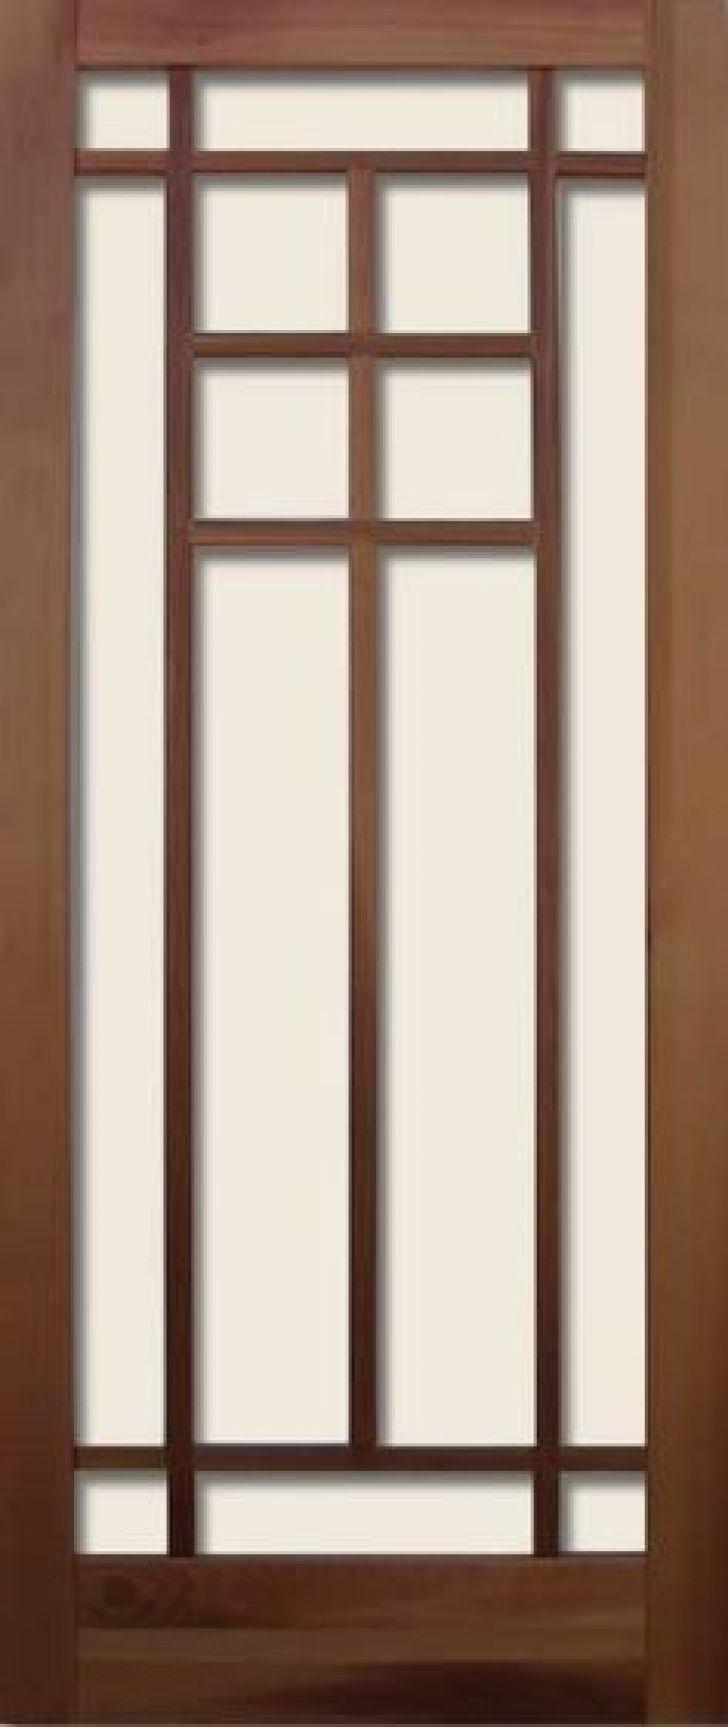 1000 ideas about storm doors on pinterest wood screen for Wood screen doors